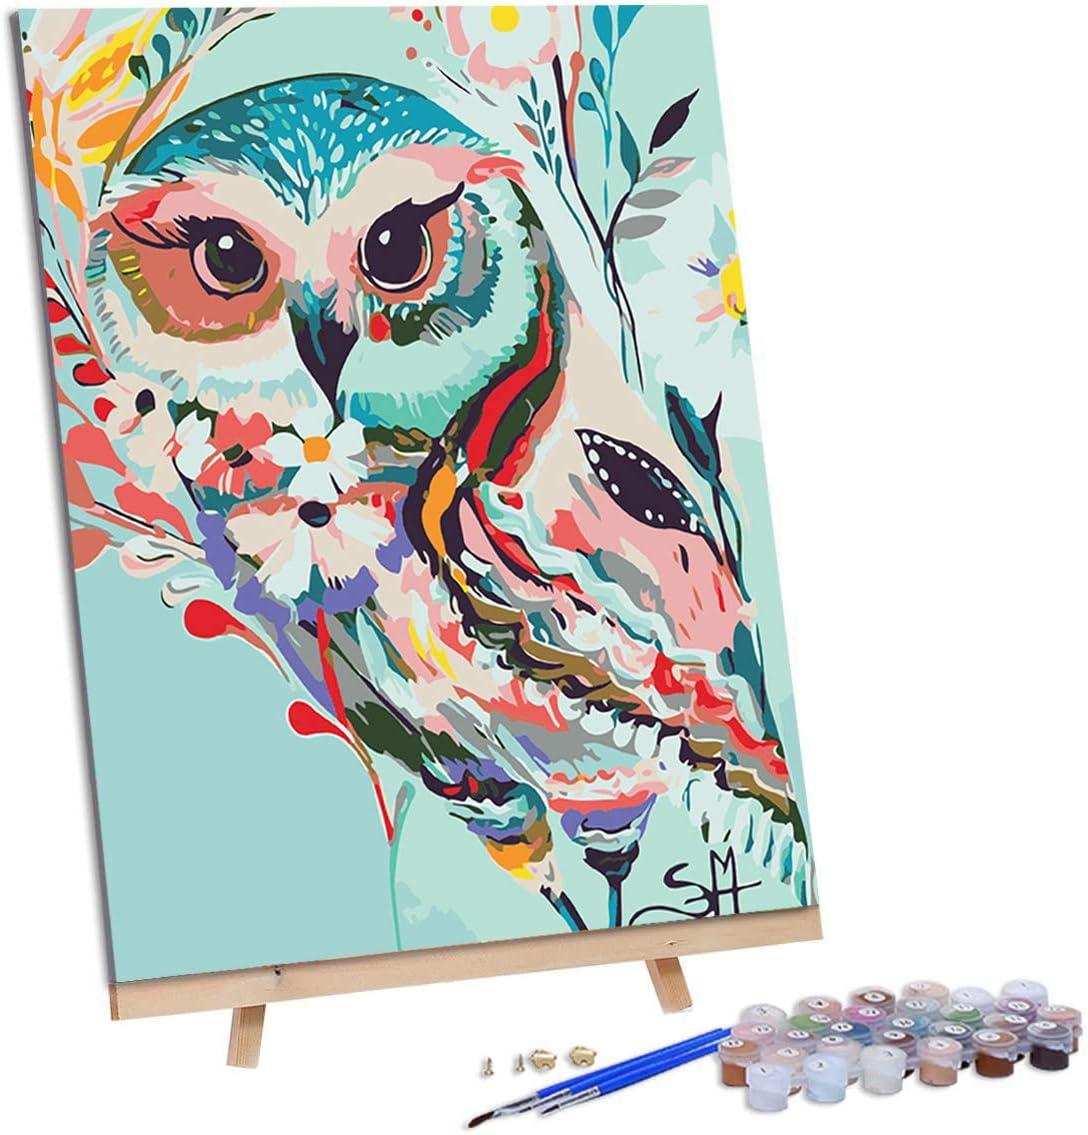 pintura por números adultos 40 x 50 cm